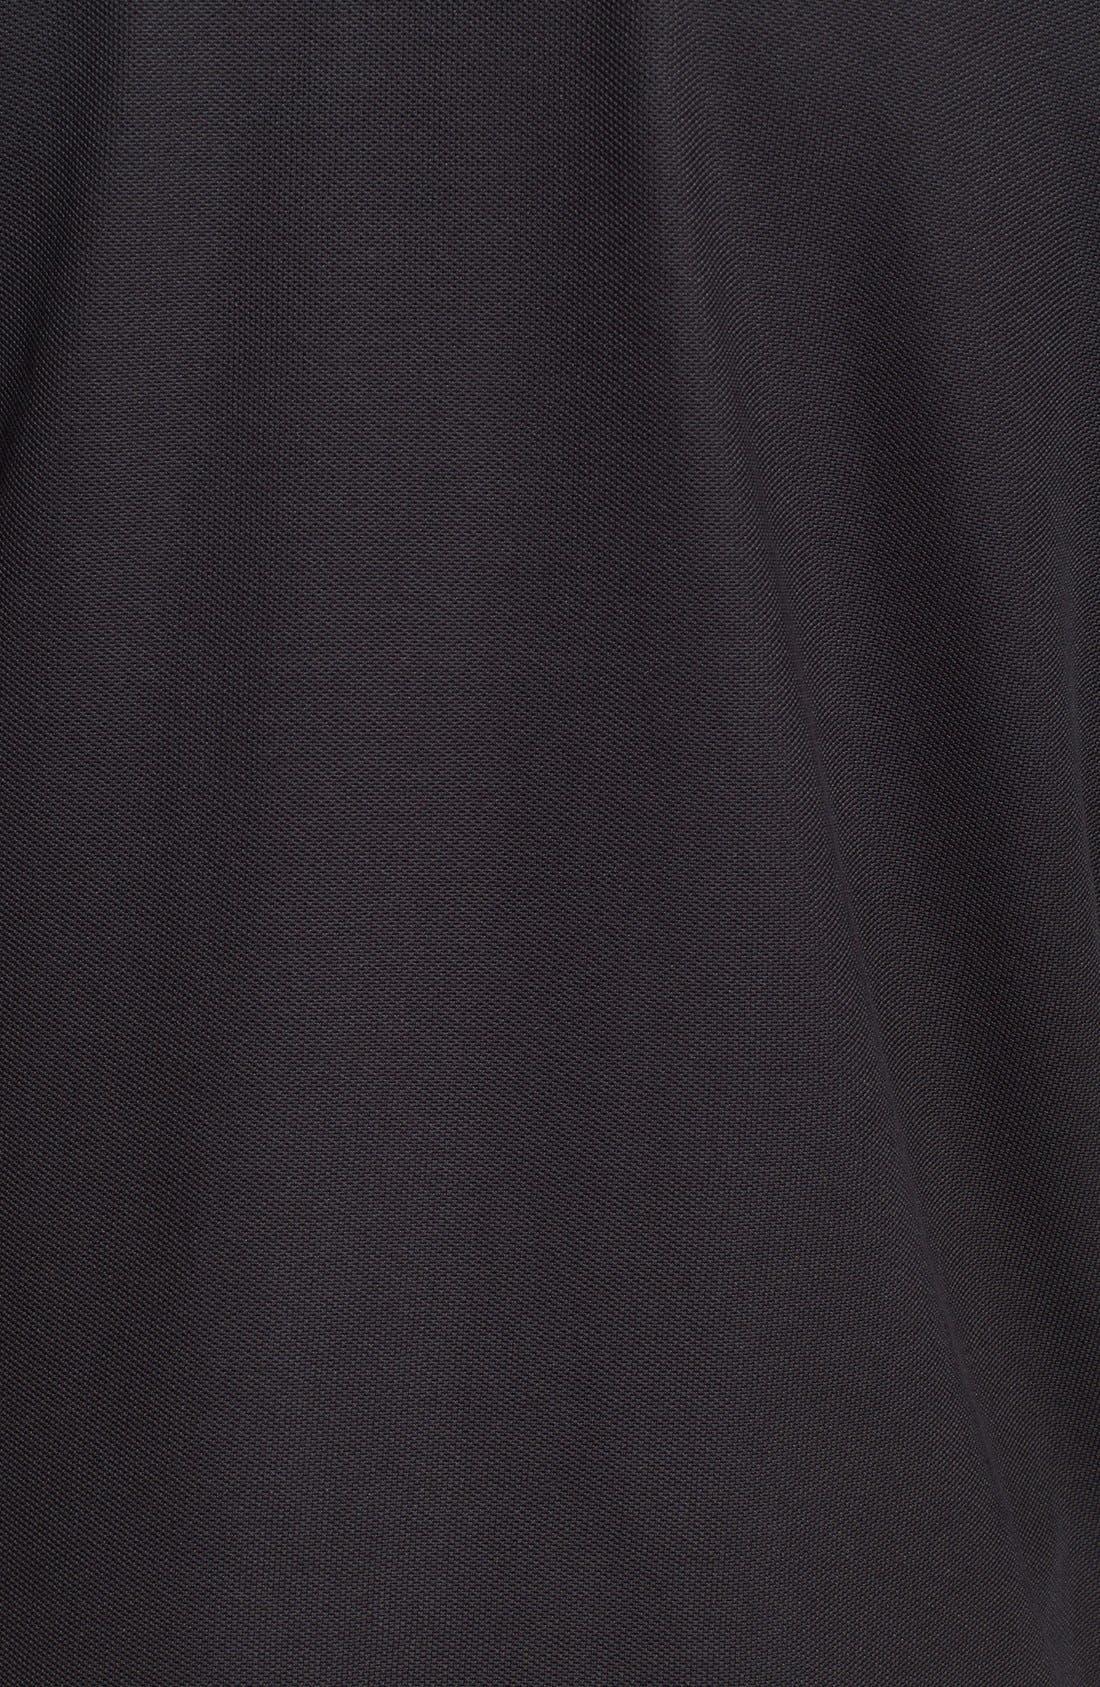 Emfielder Long Sleeve Polo,                             Alternate thumbnail 50, color,